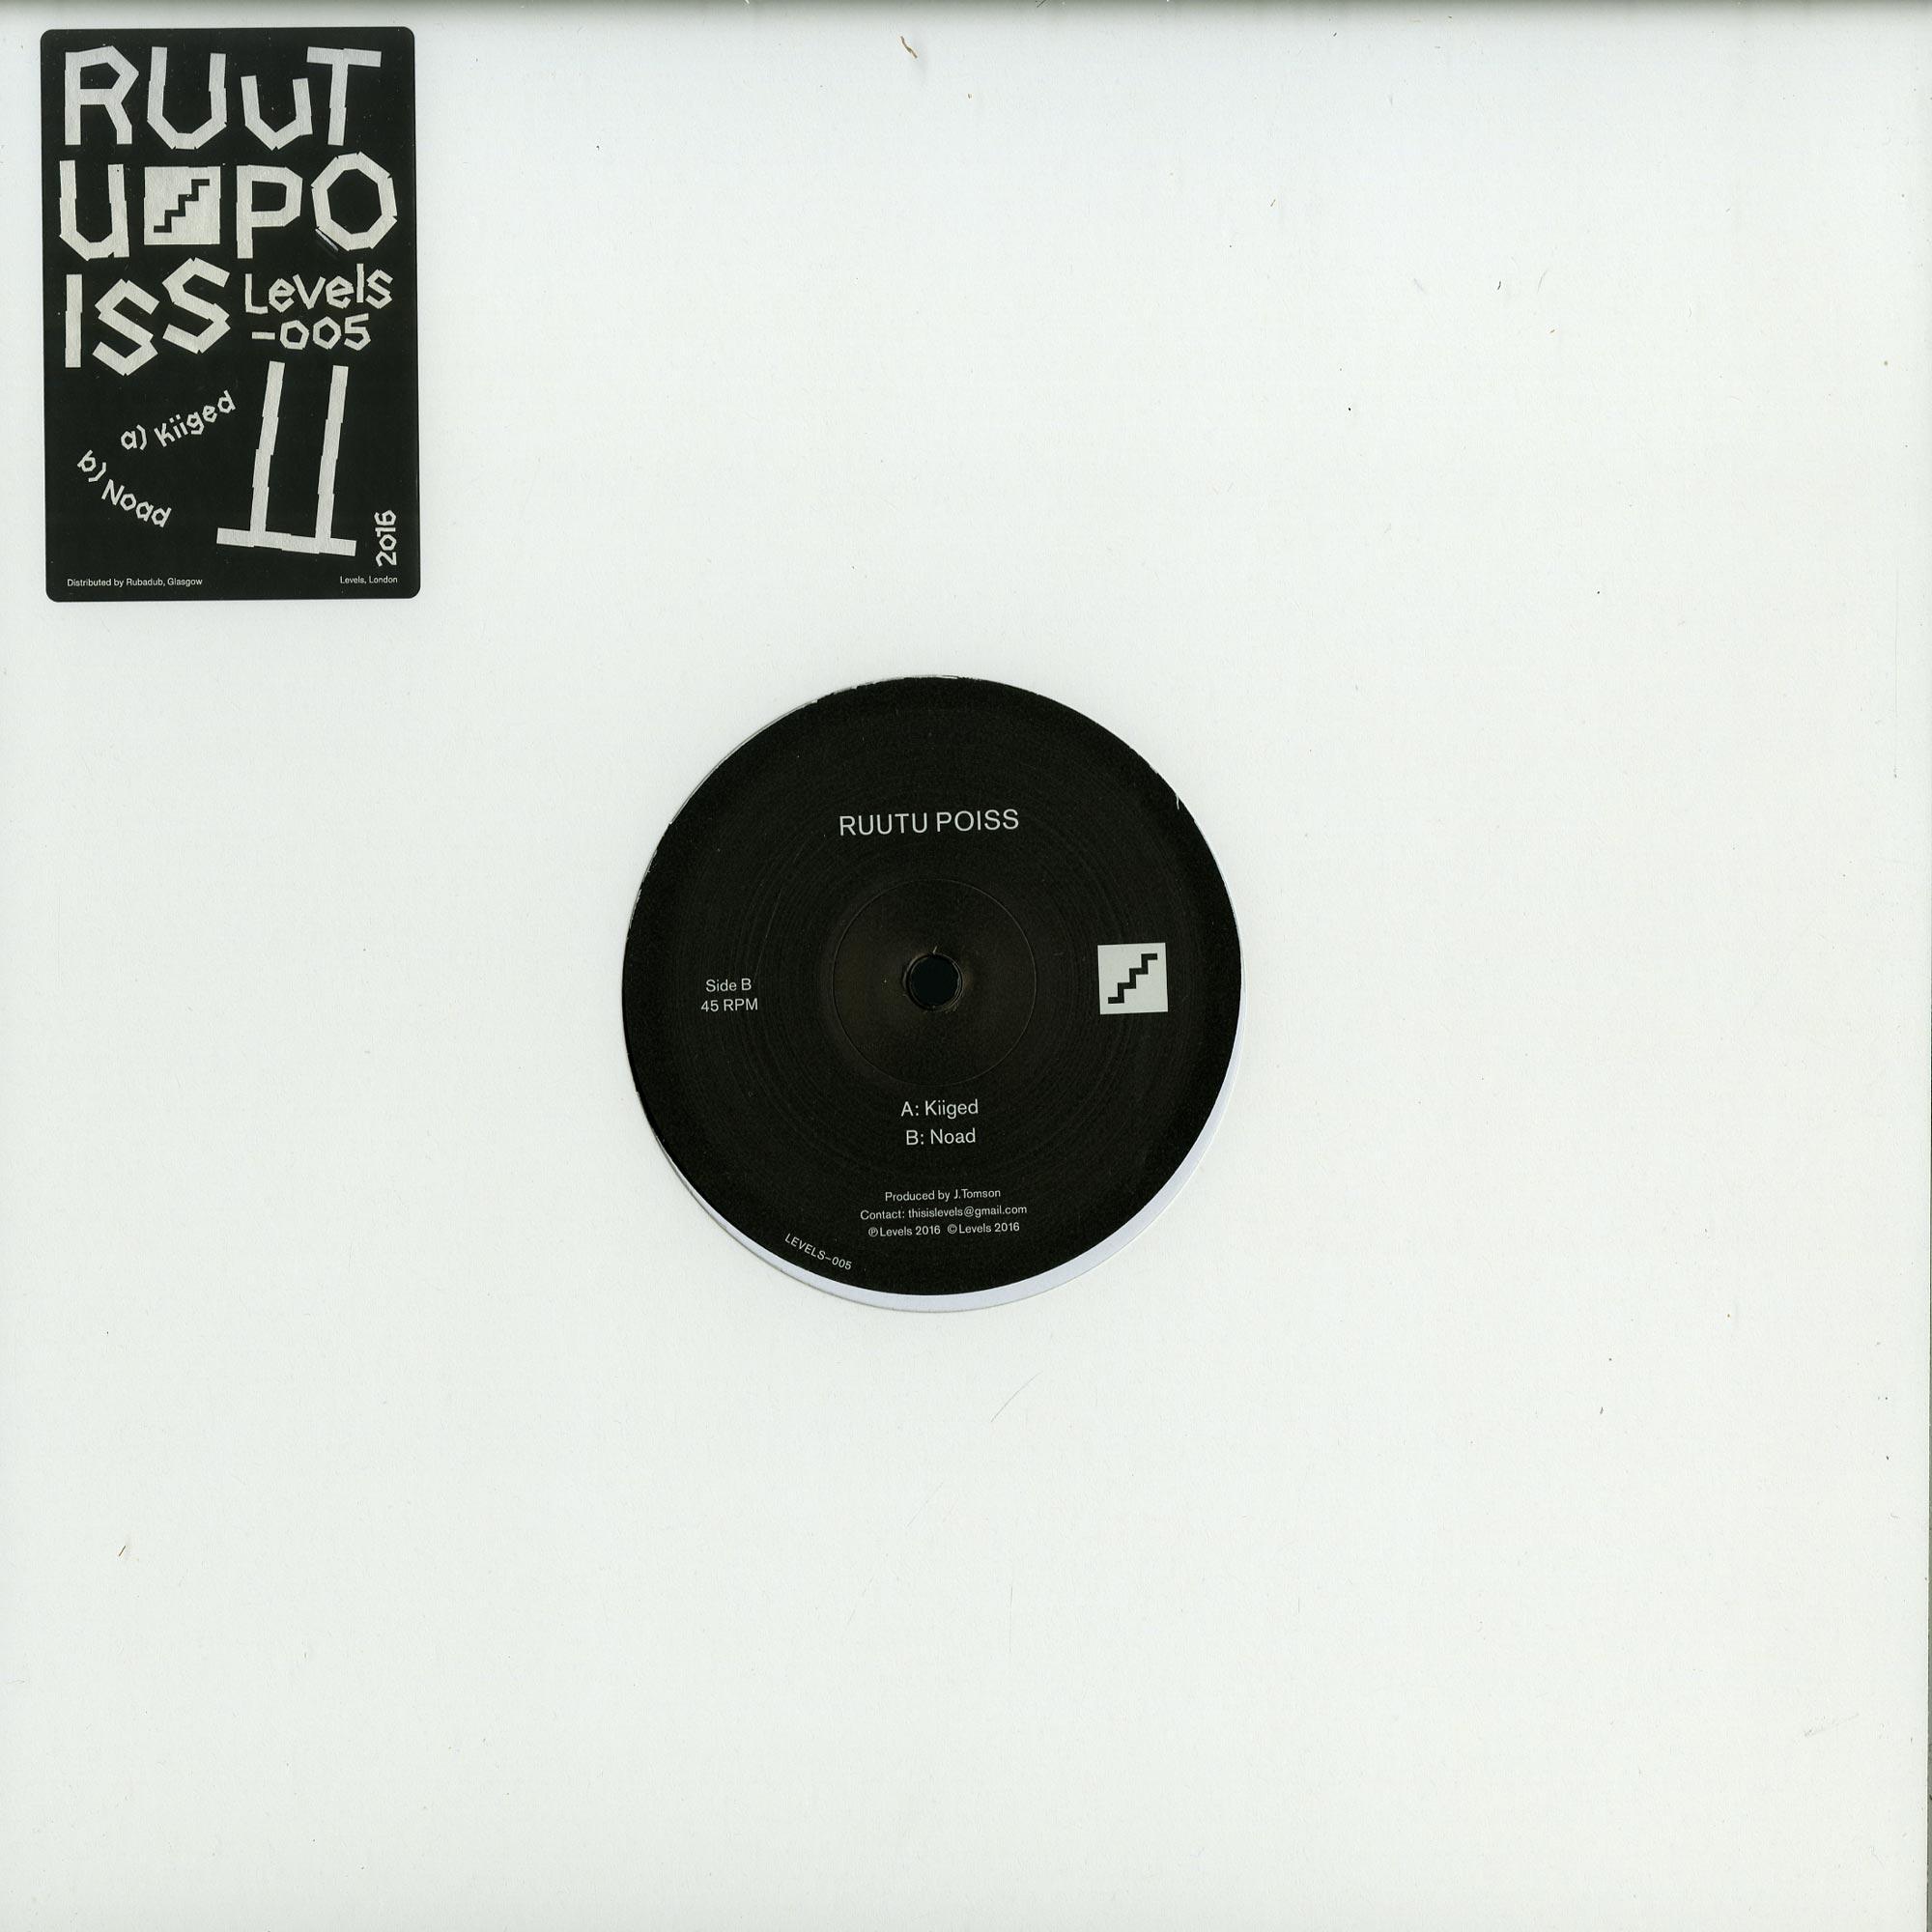 Ruutu Poiss - KIIGED / NOAD